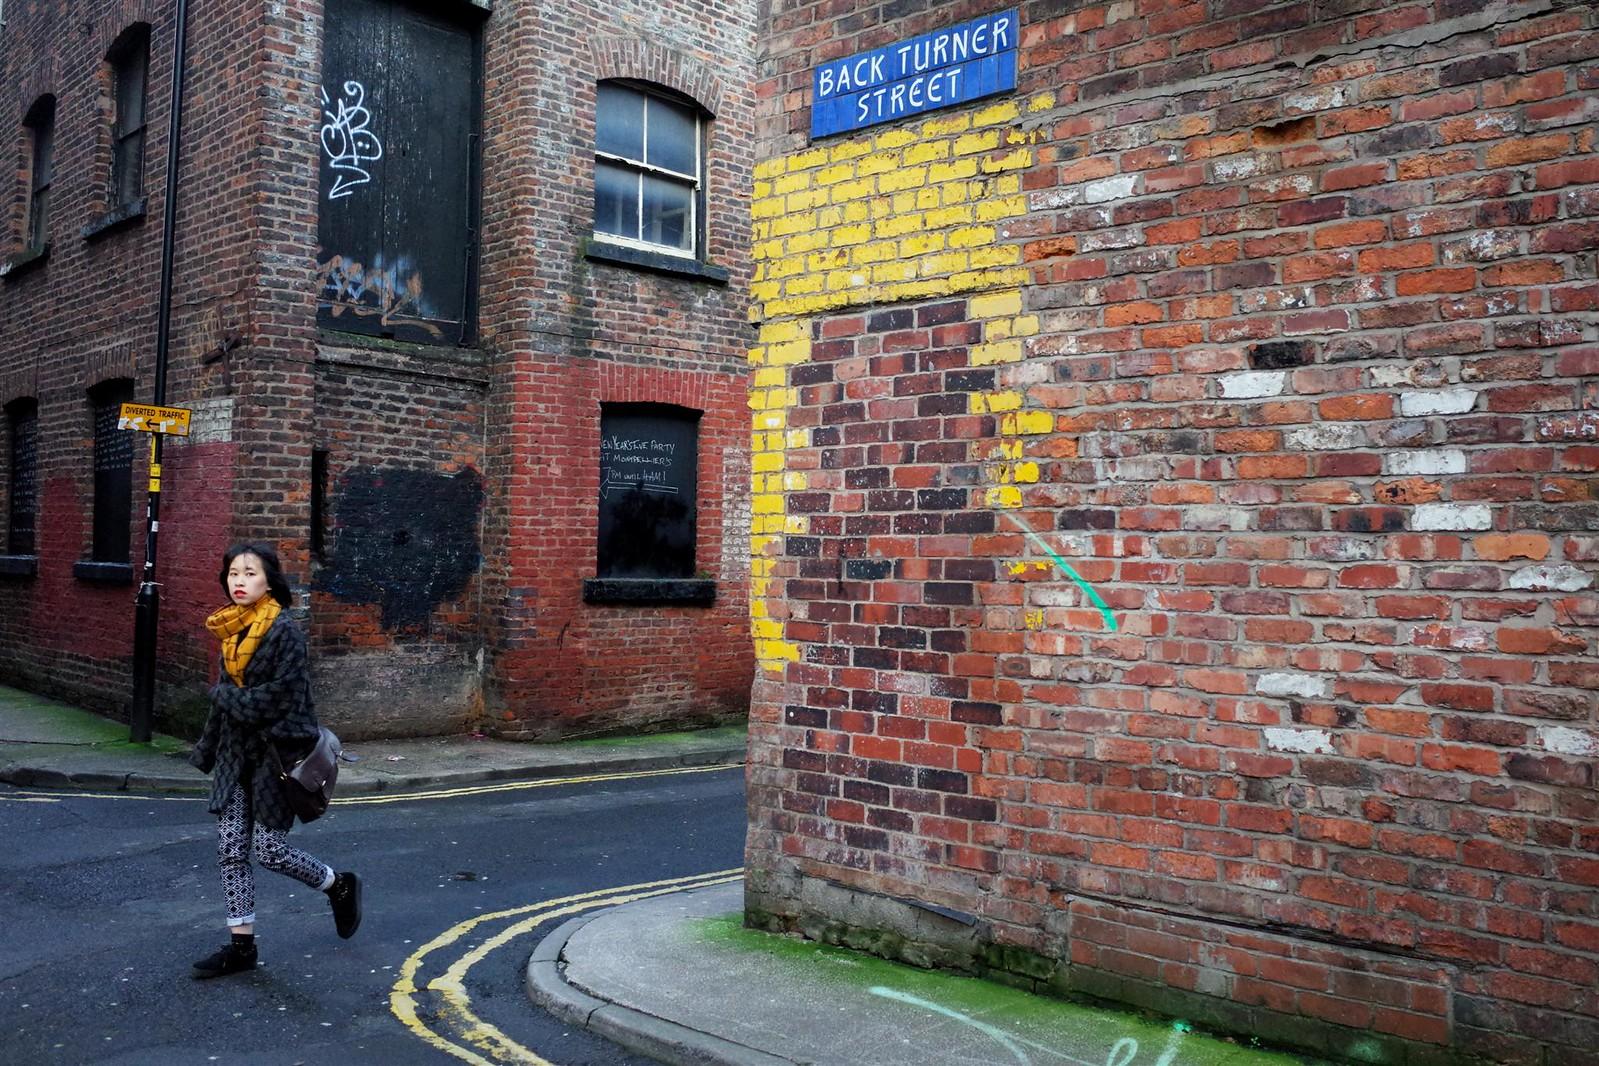 Back Turner Street   by Jonathan Taylor1